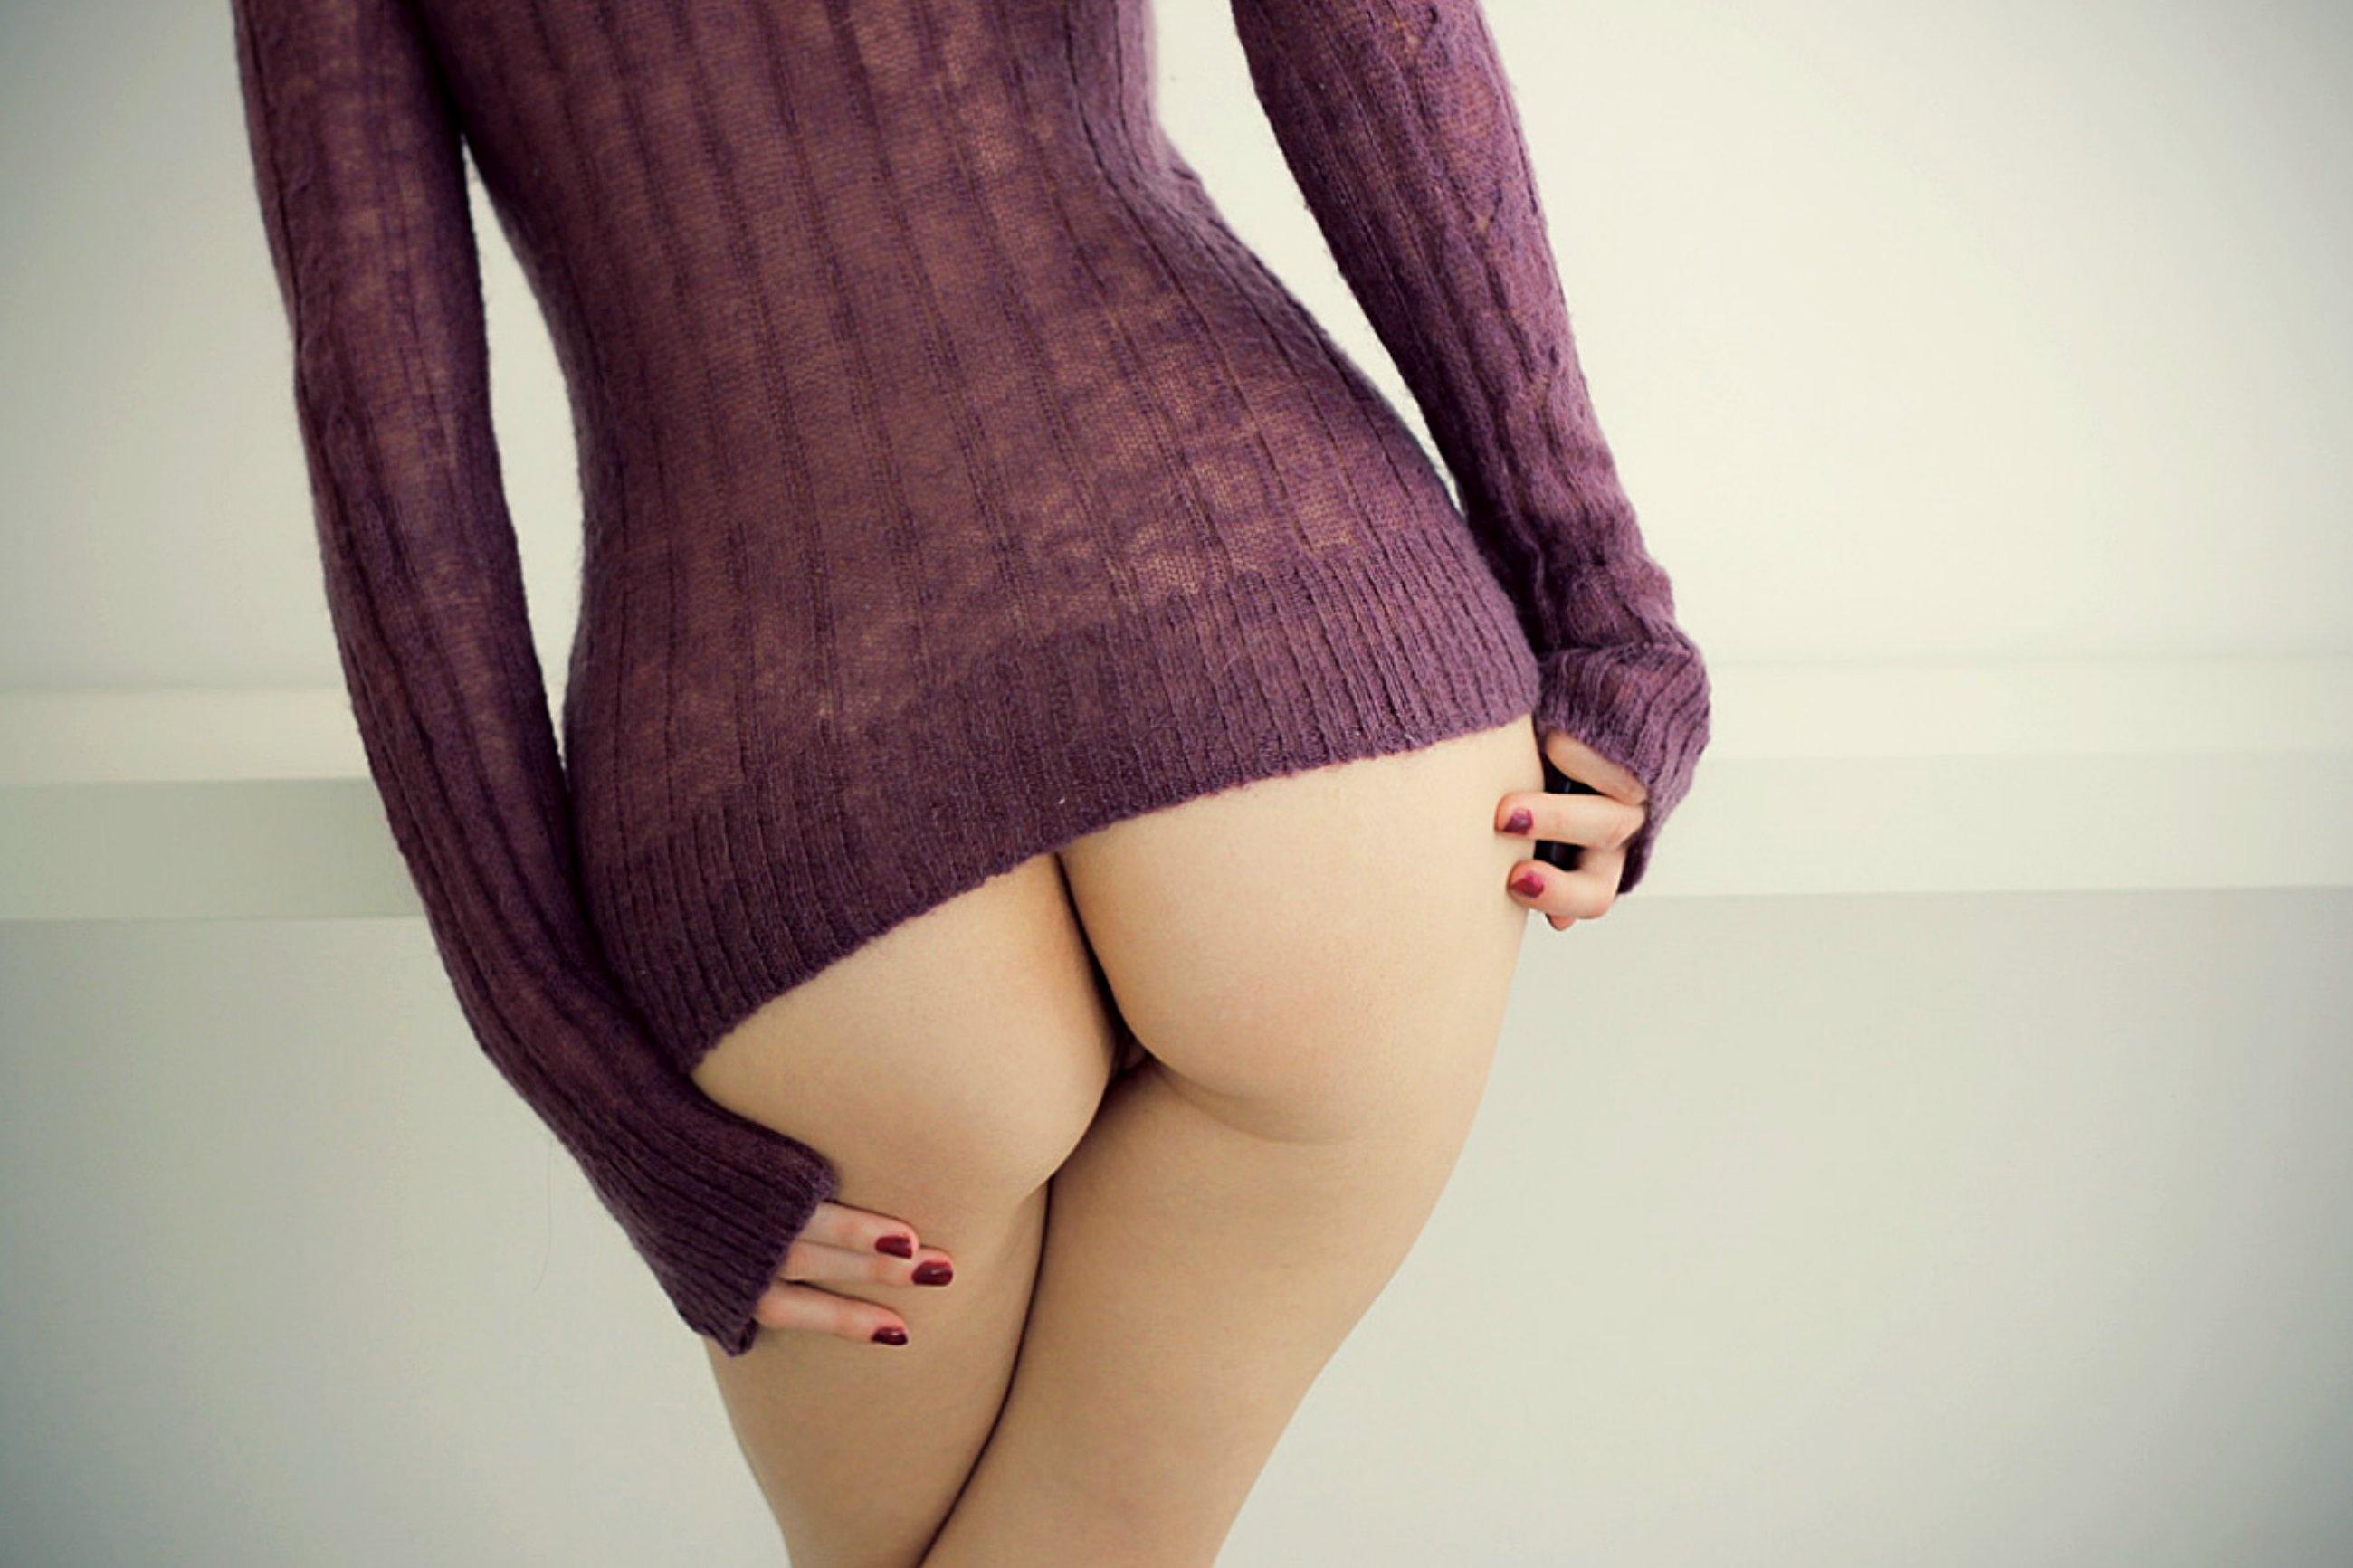 Эро фото свитер 10 фотография